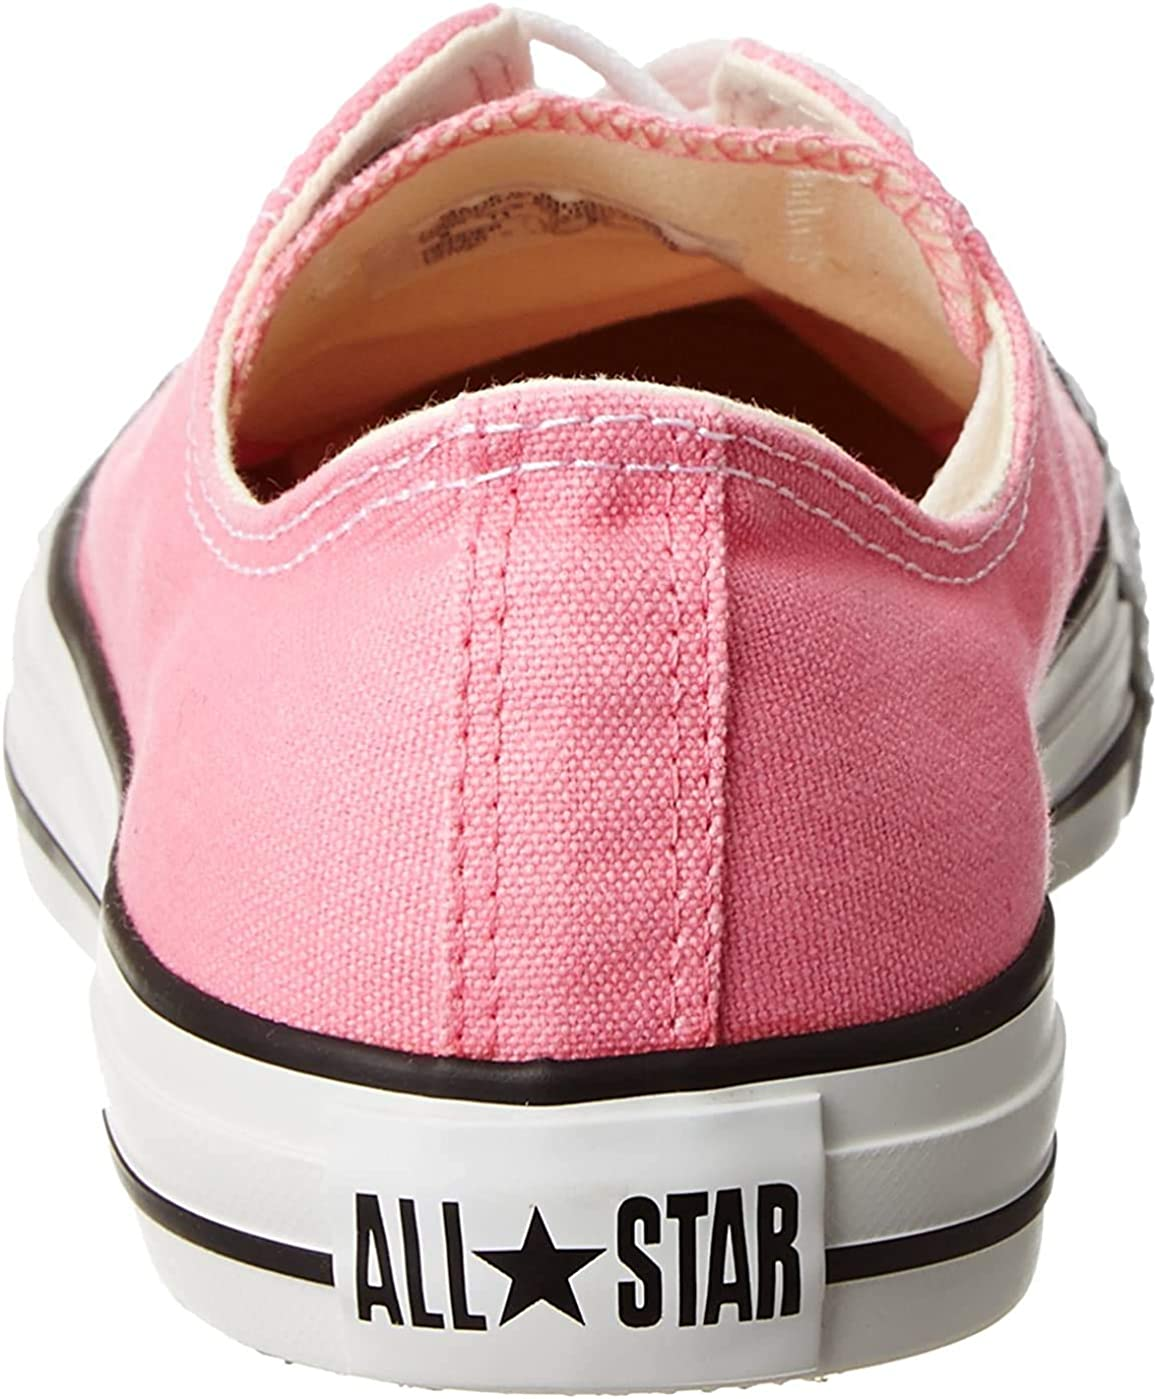 Converse Chuck Taylor All Star Ox, Zapatillas Unisex Adulto, Rosa Pink Champagne, 39.5 EU